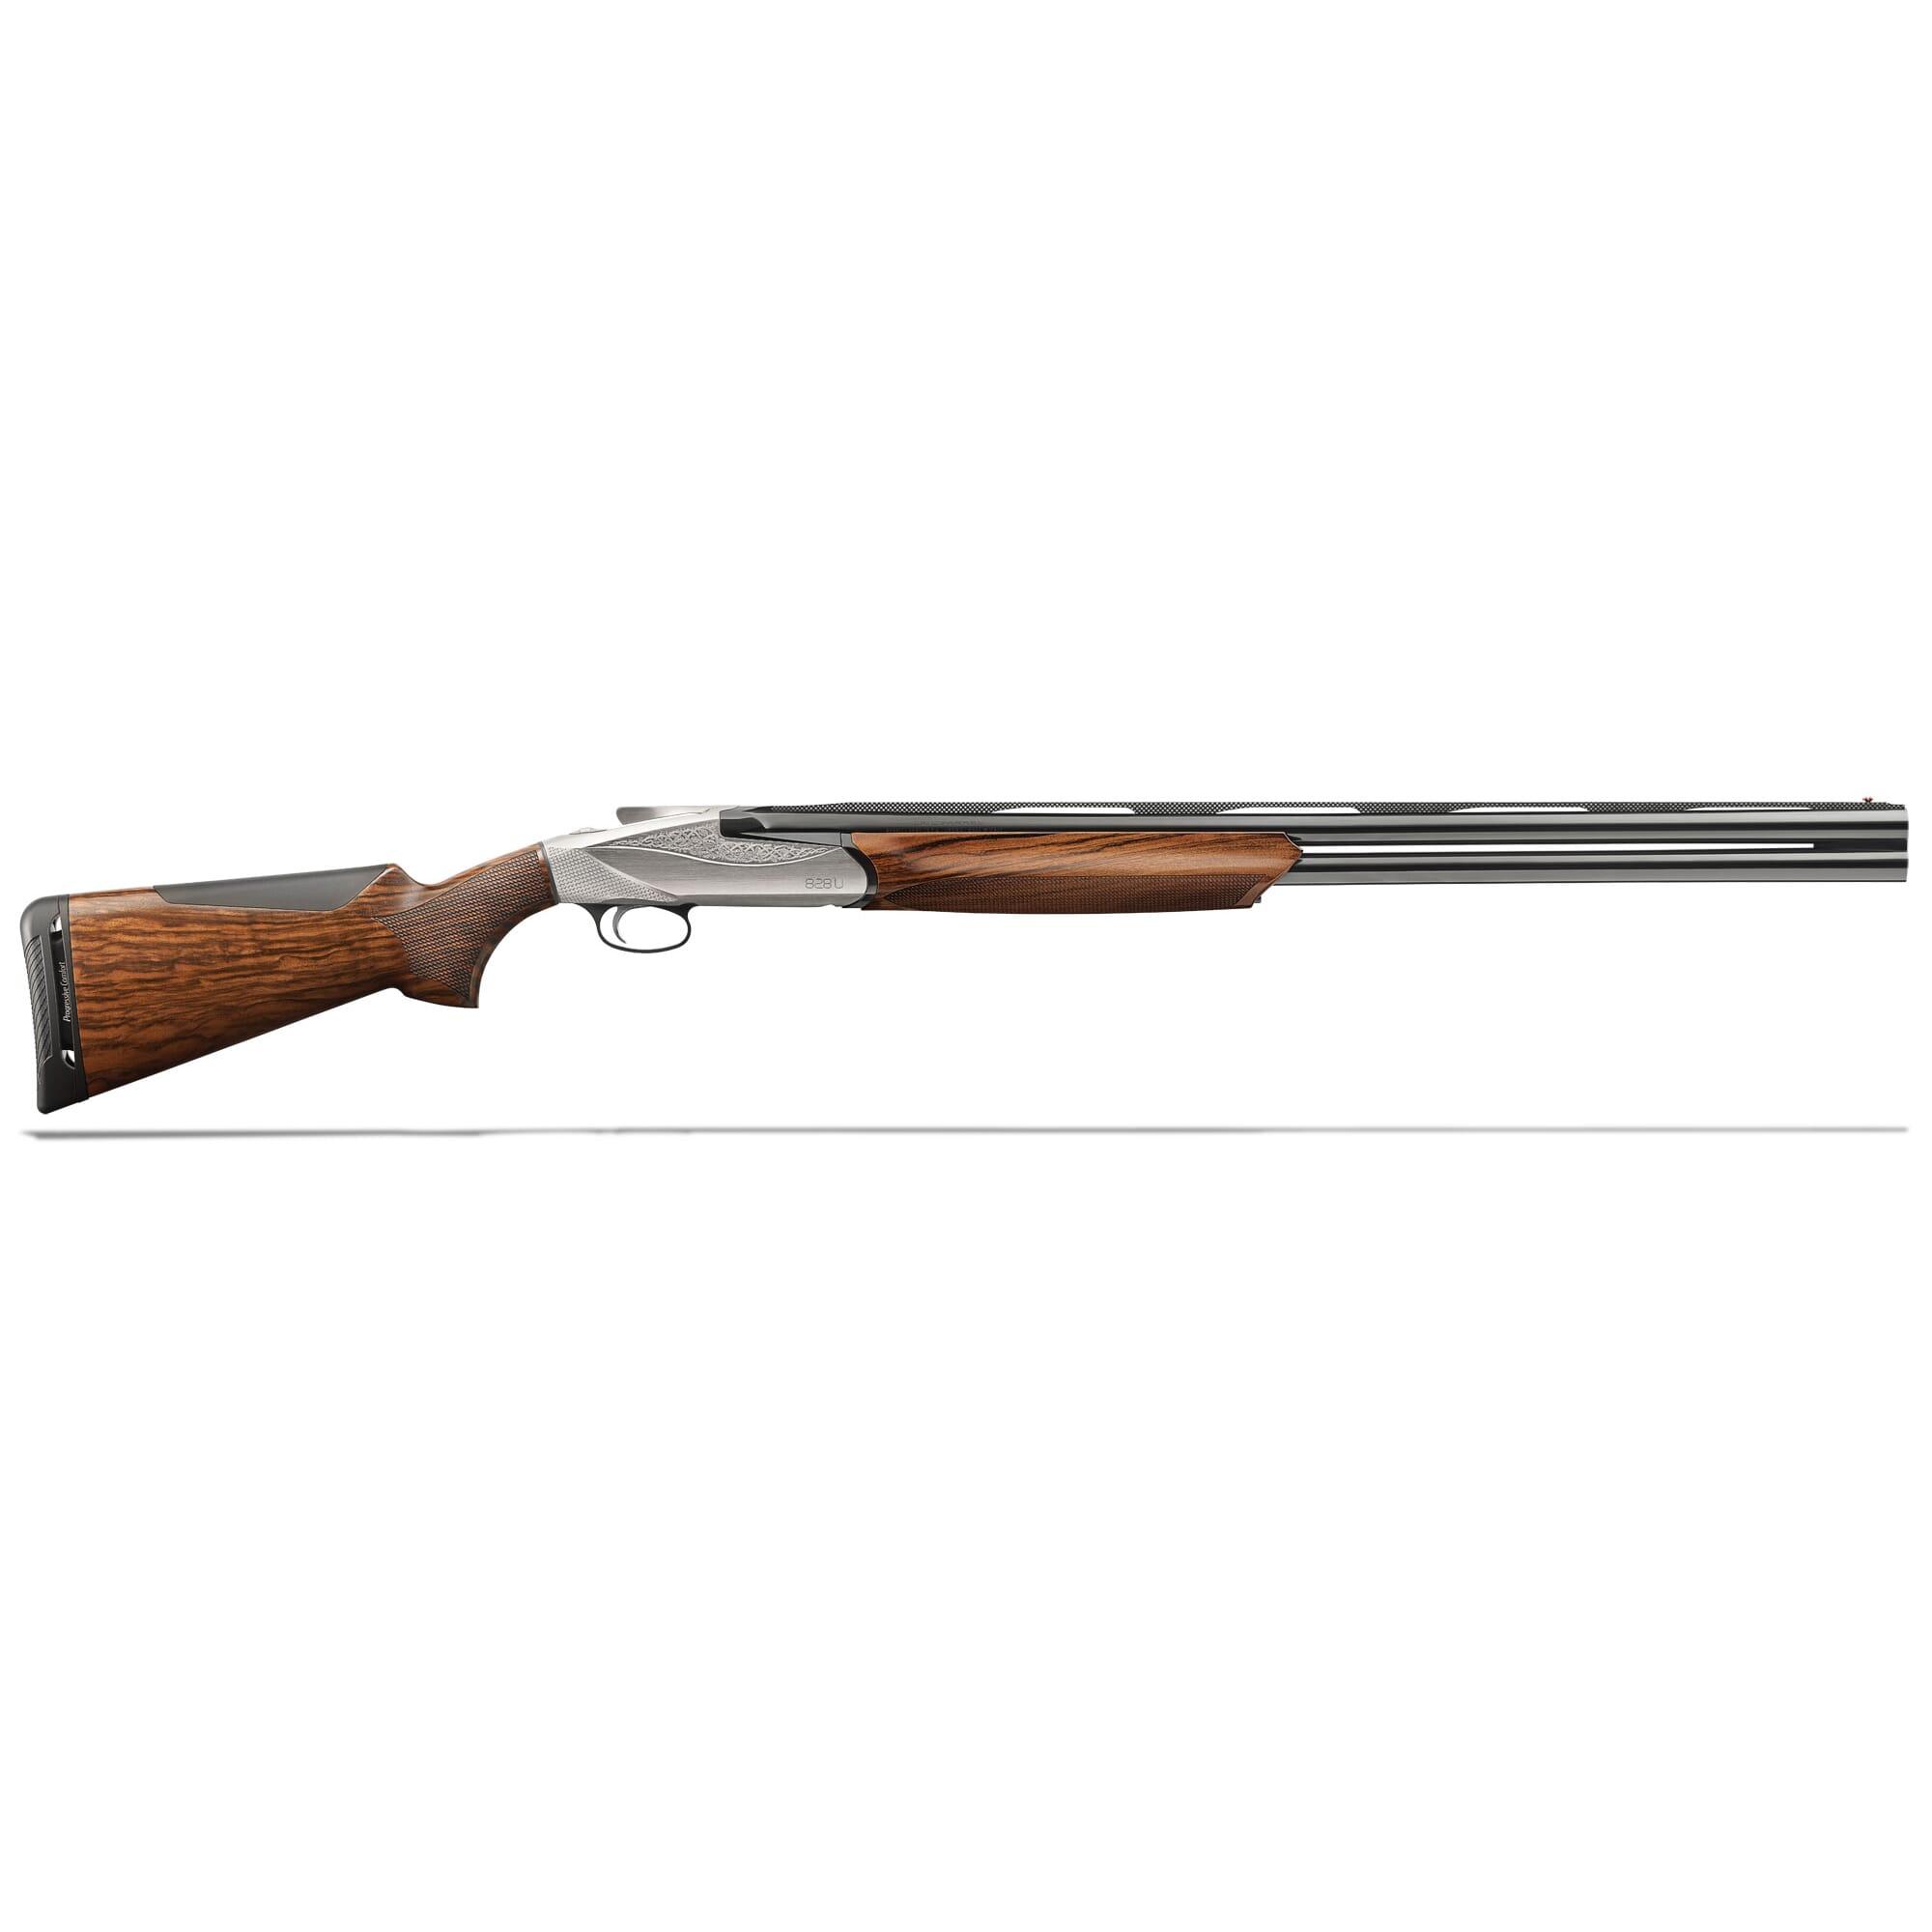 "Benelli 828U 12-gauge 26"" Nickel Receiver Shotgun 10703"